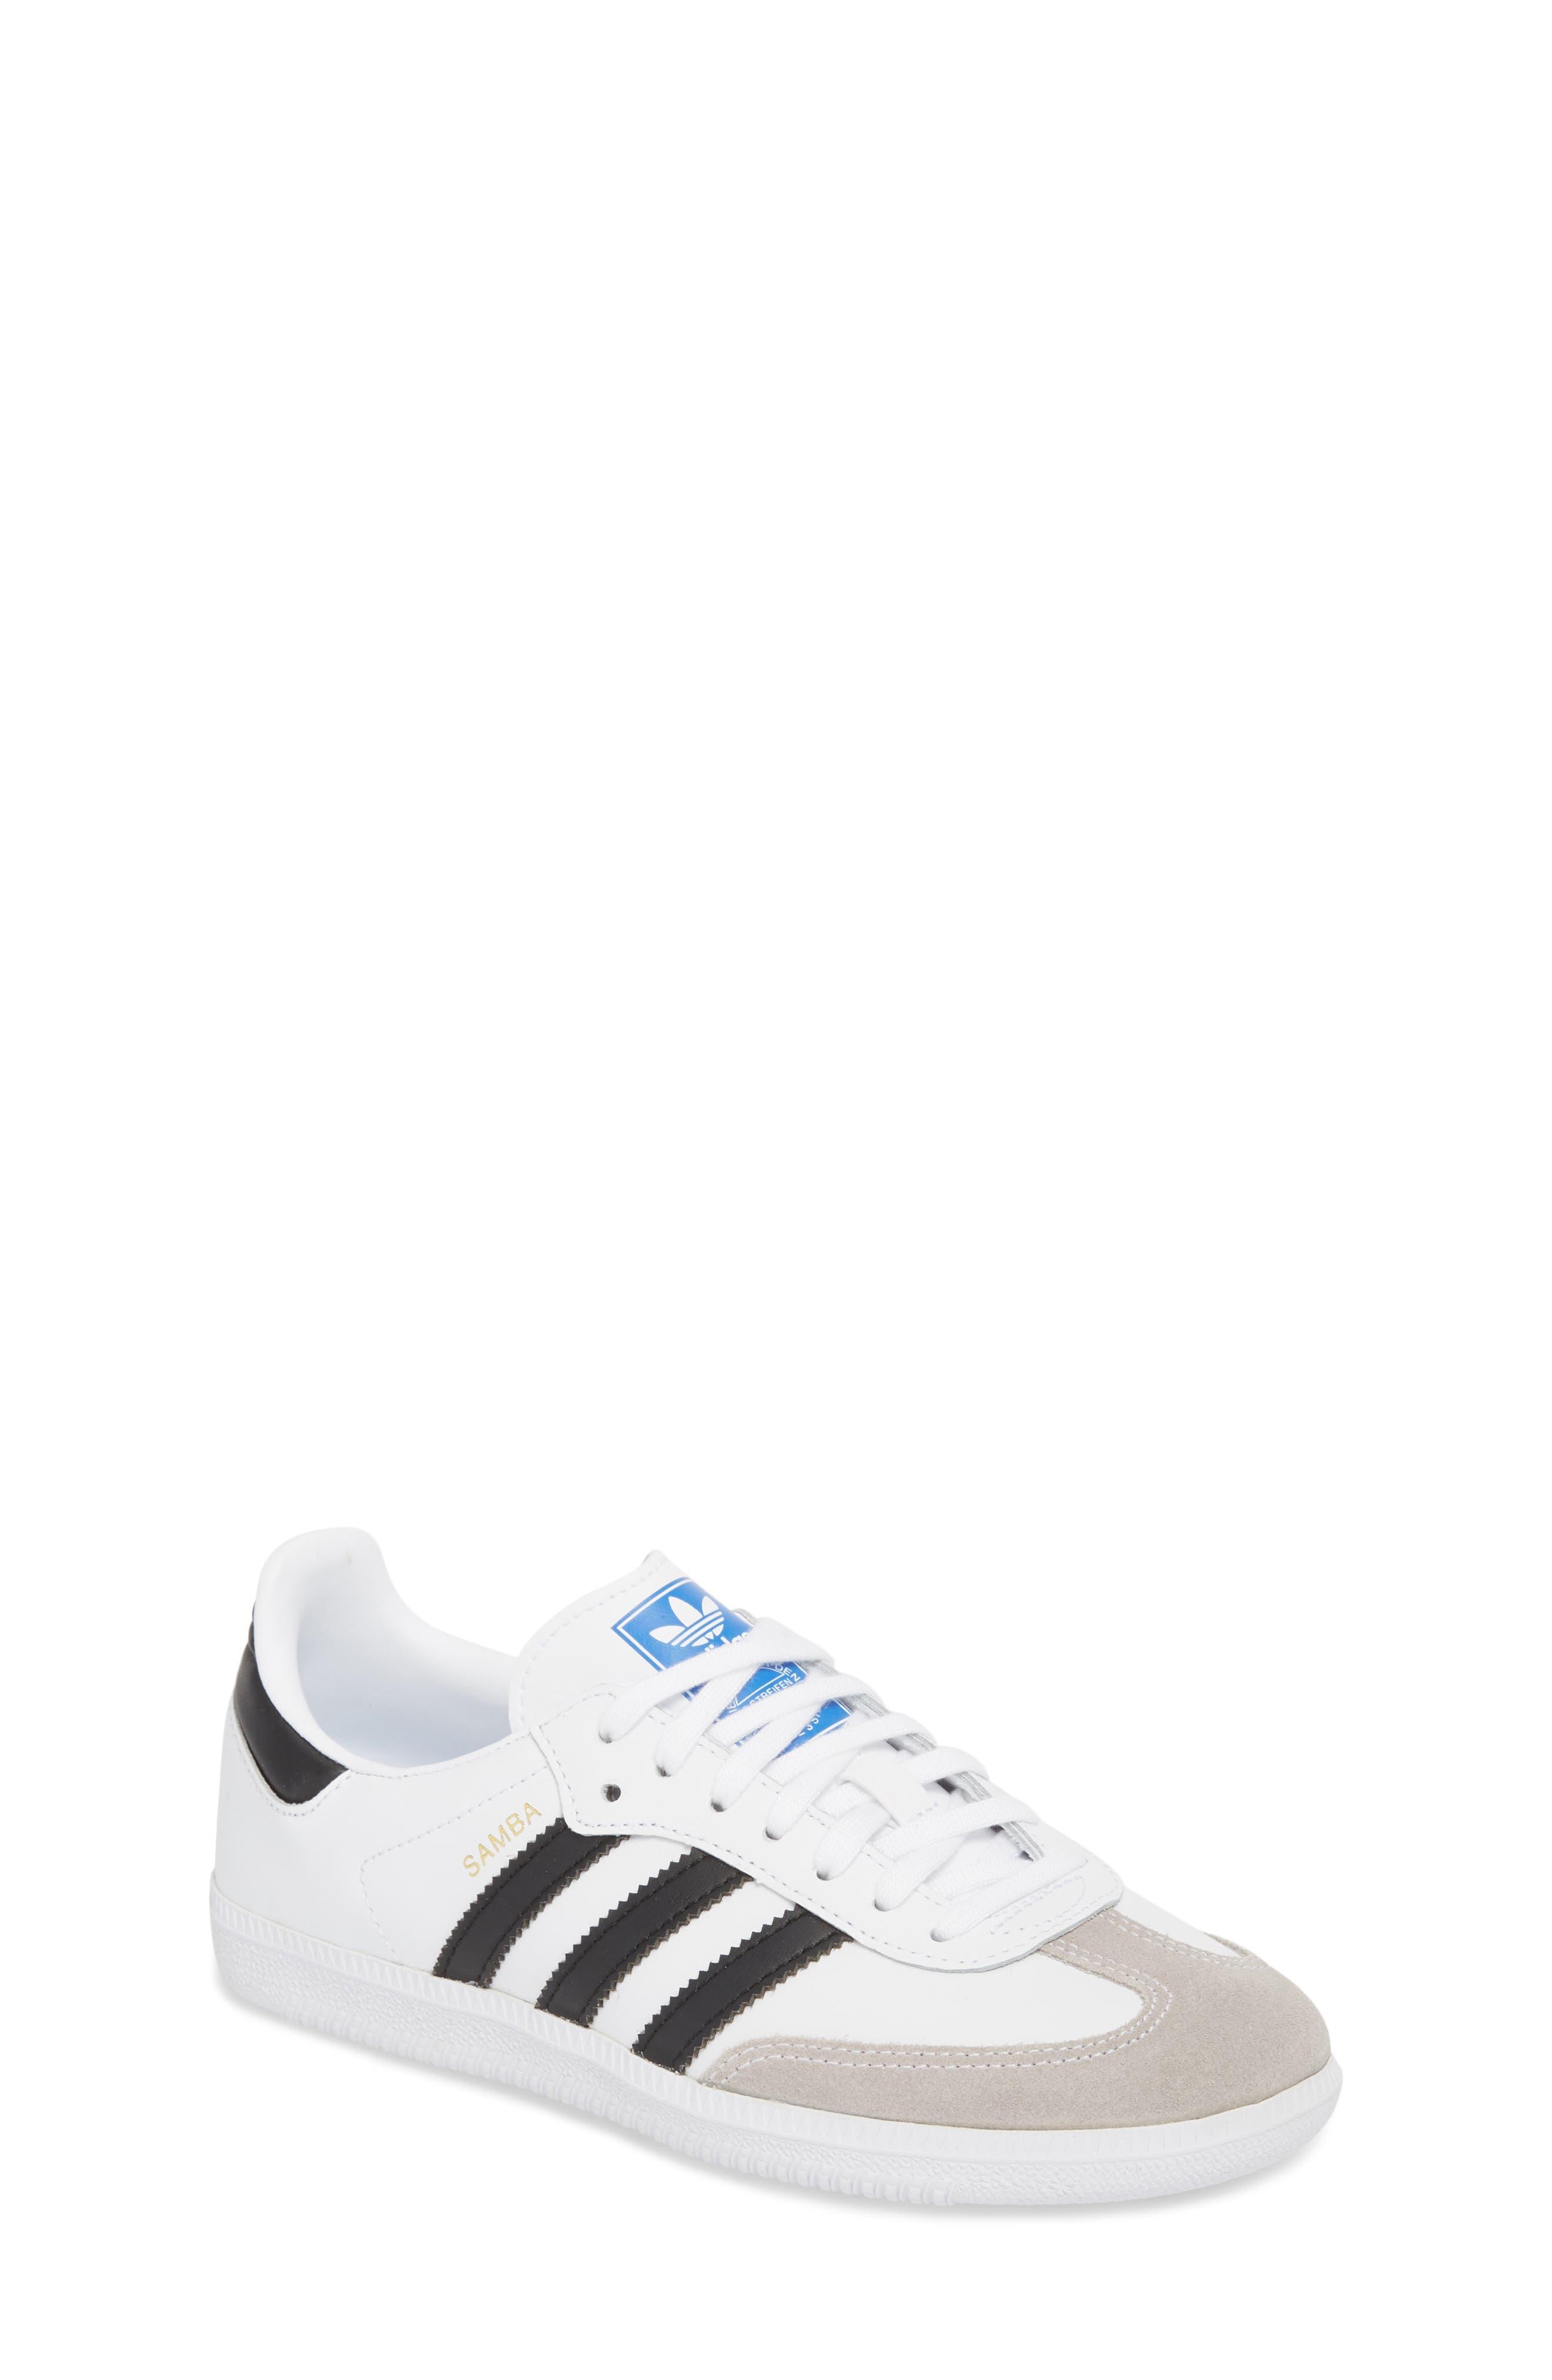 8301a16929cd ... switzerland adidas samba og sneaker baby walker toddler little kid big  kid 6878e 5b5d0